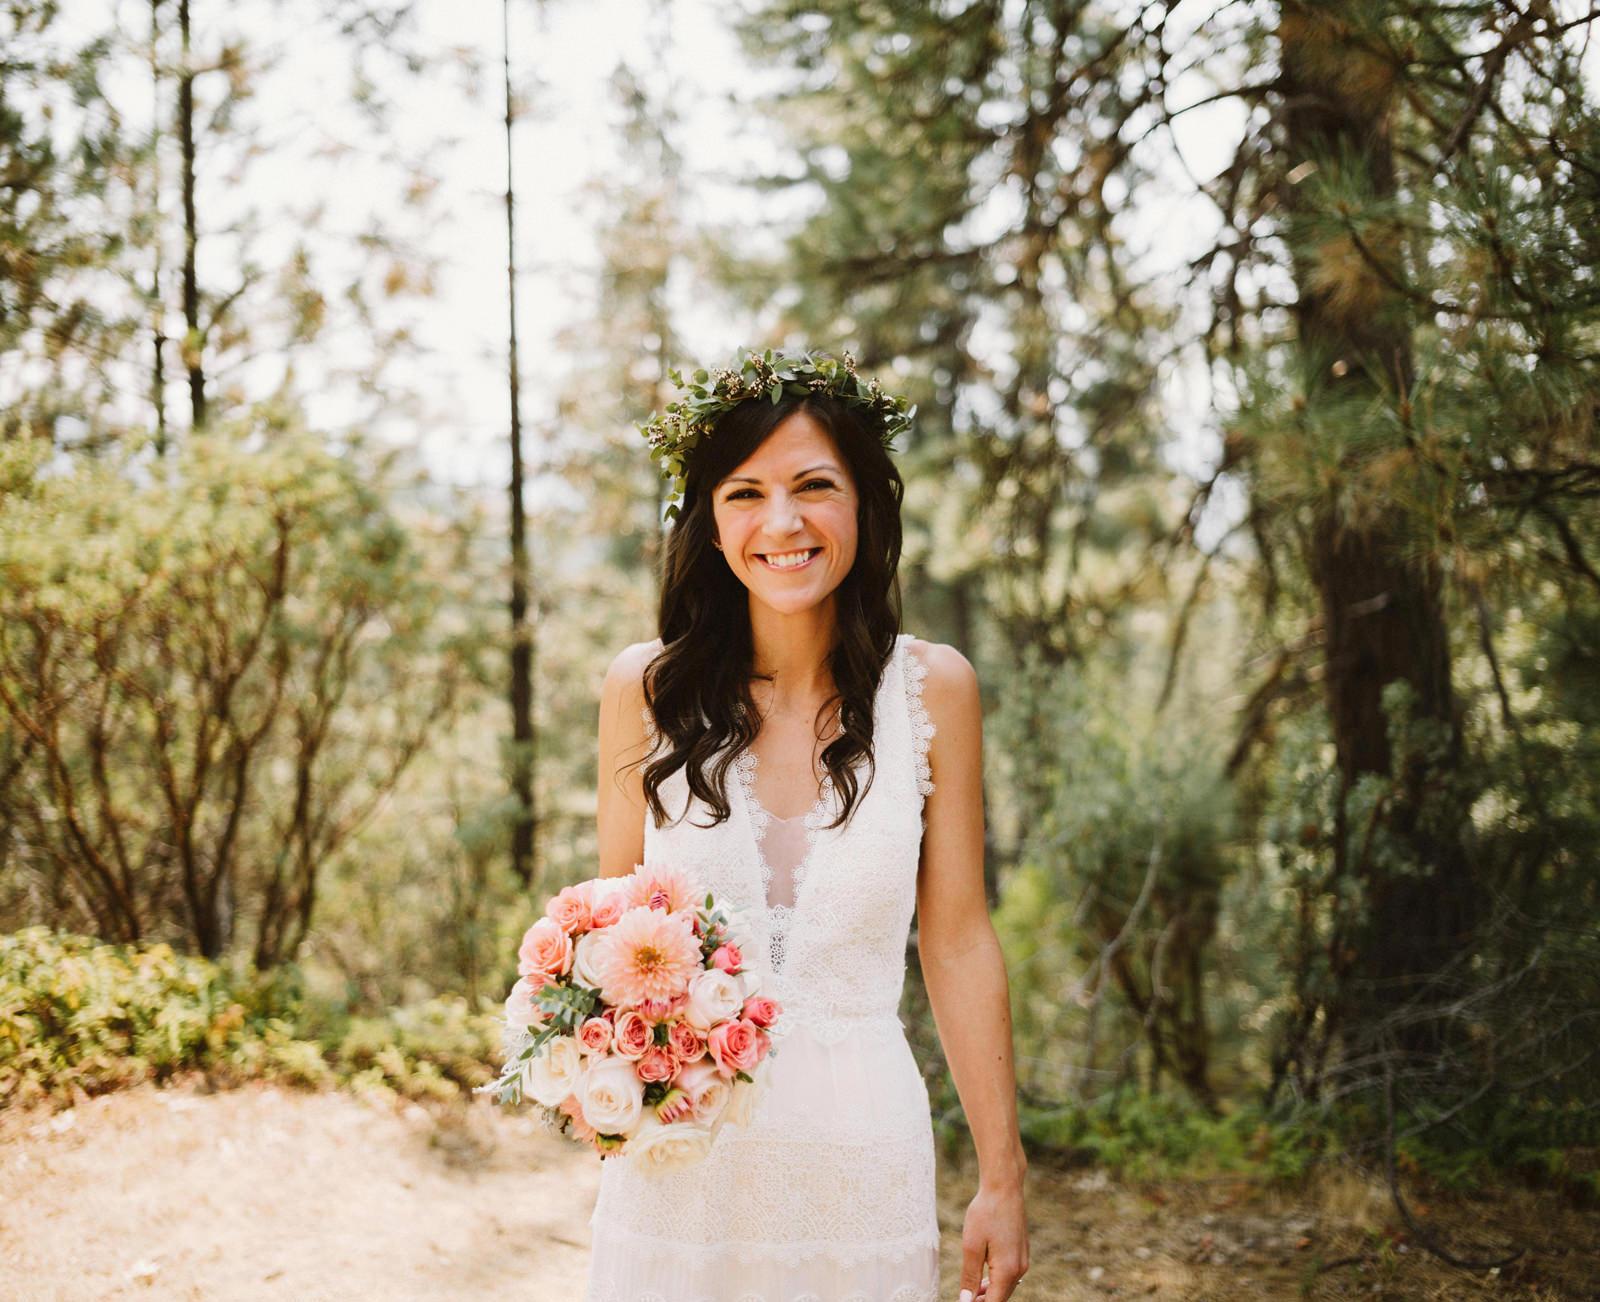 yosemite-intimate-wedding-014 YOSEMITE INTIMATE WEDDING